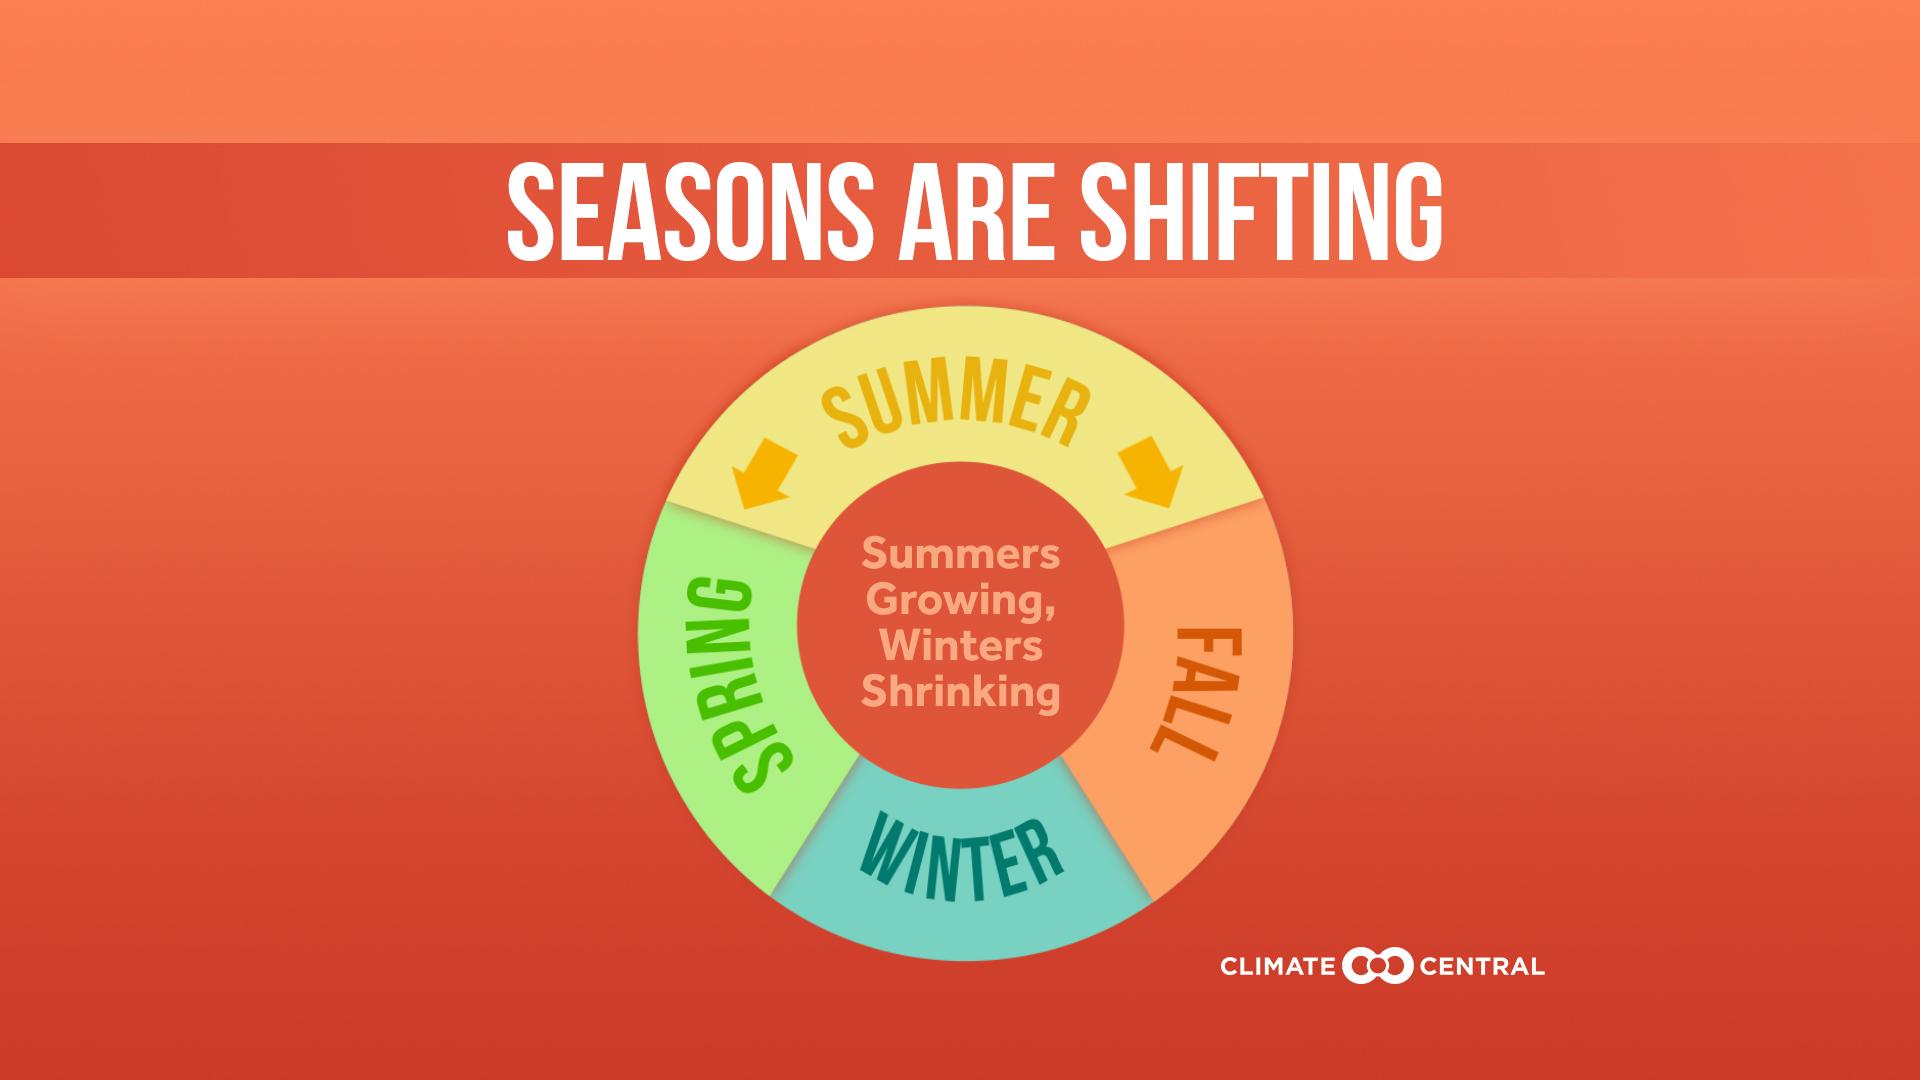 seasons shifting